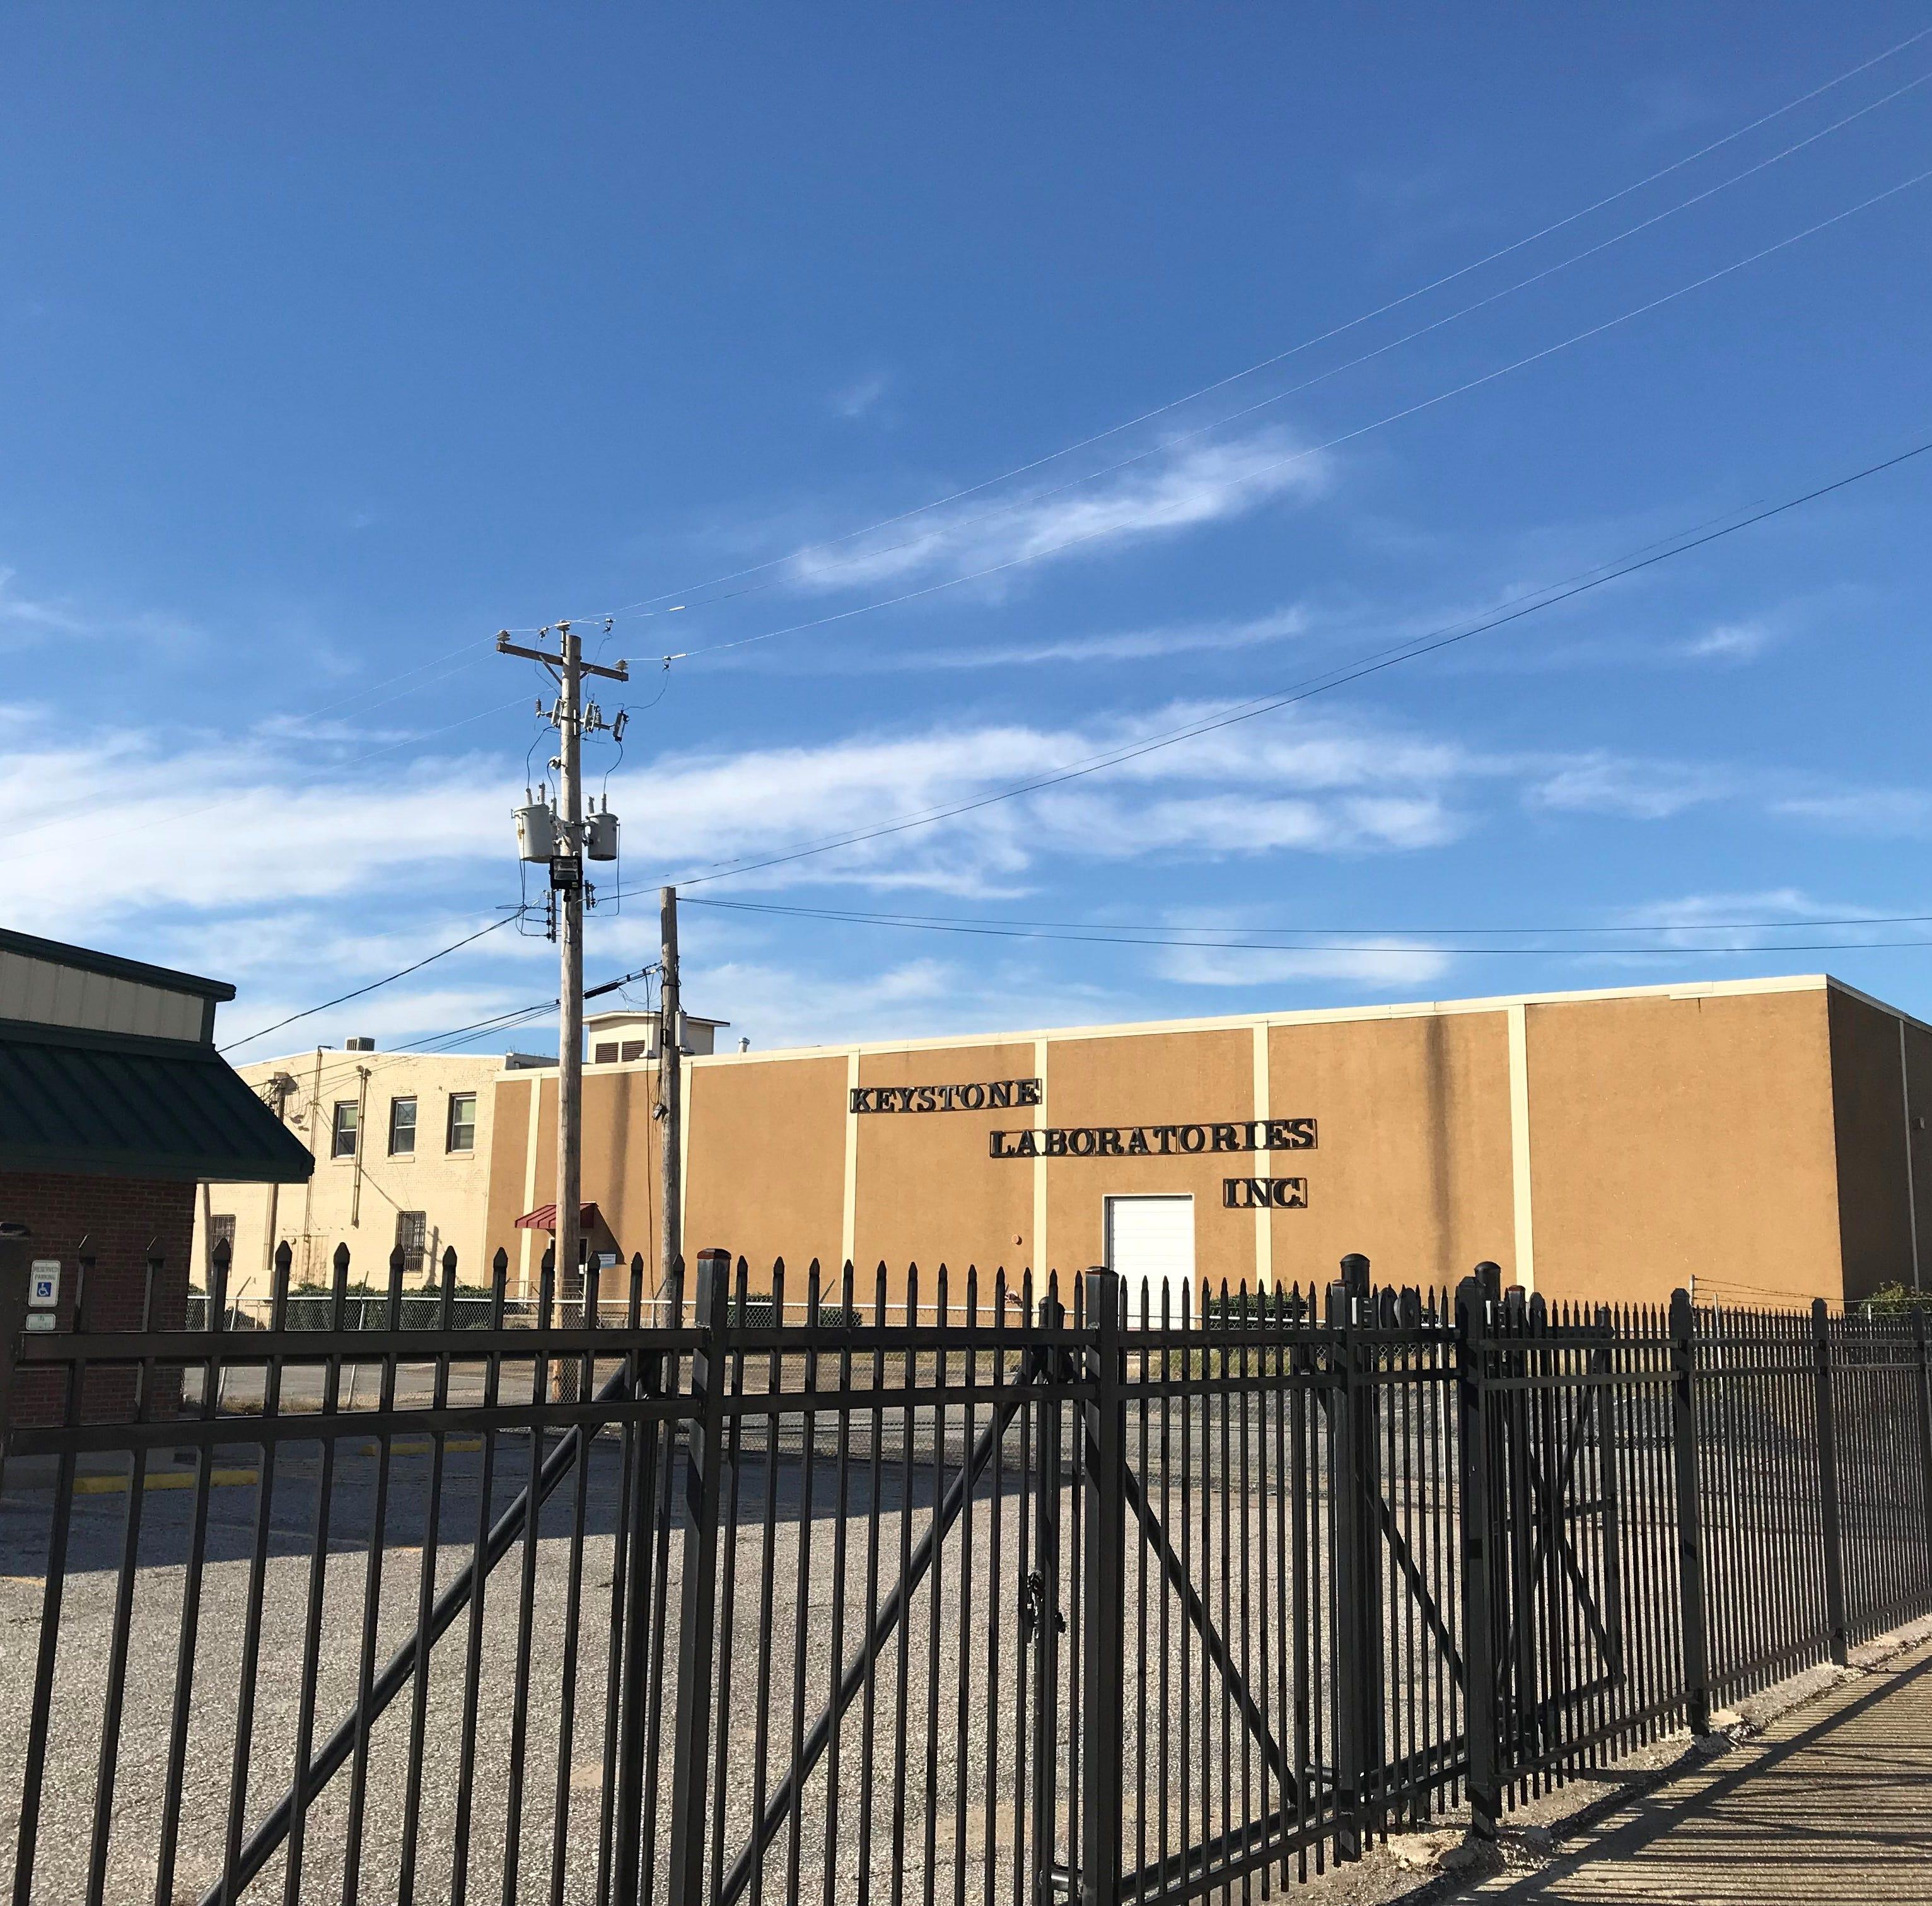 Memphis' Keystone Laboratories violated drug safety requirements, DOJ complaint alleges